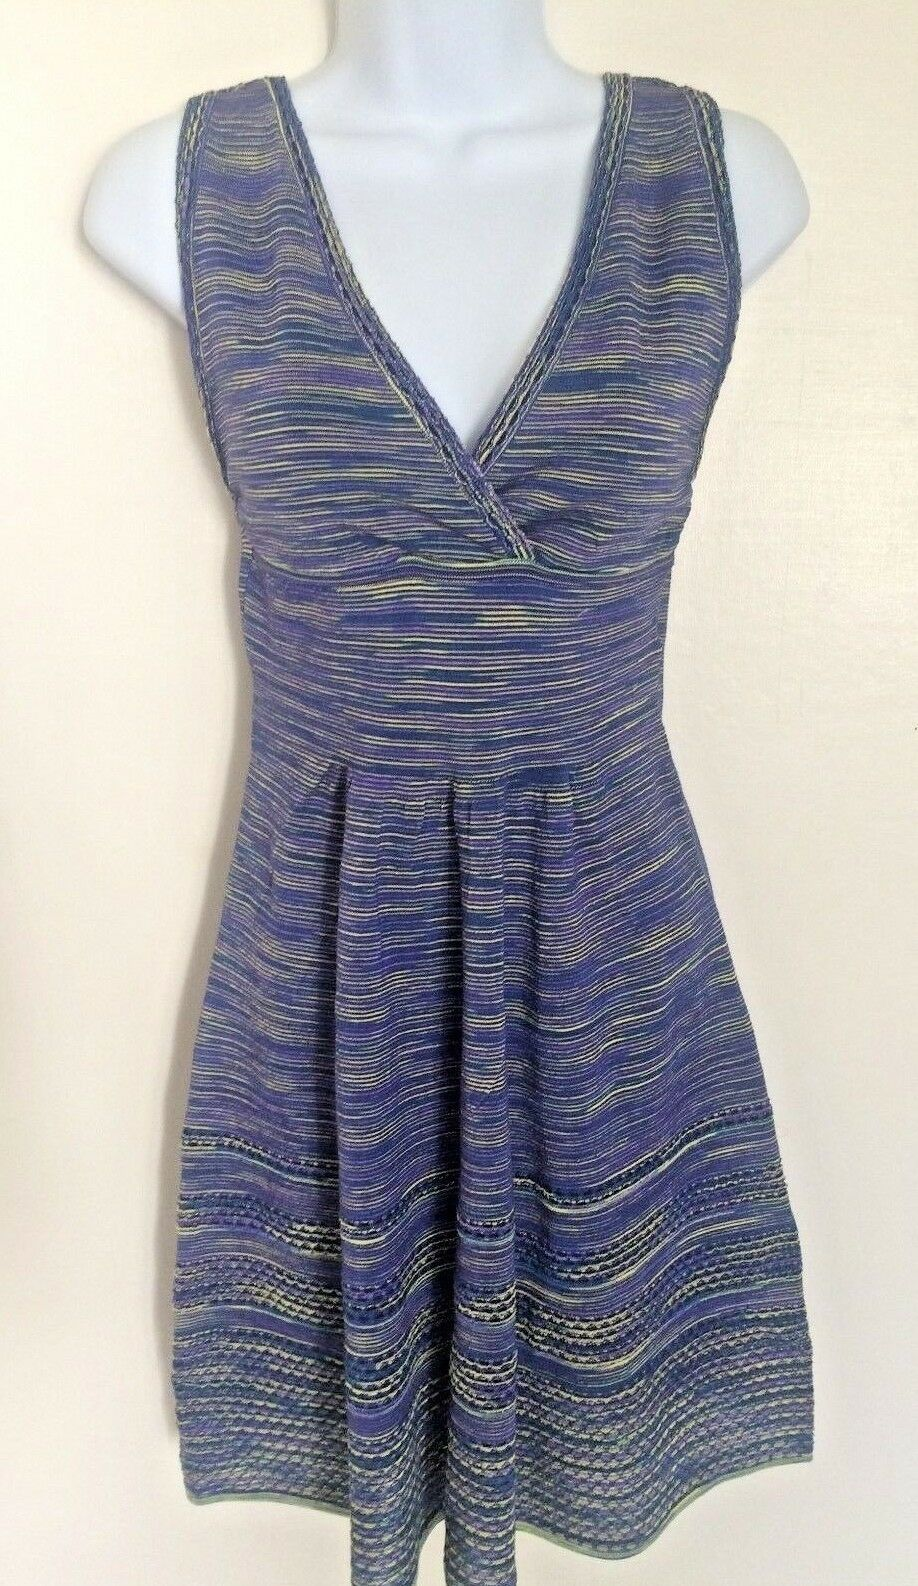 NWT NWT NWT  695 M Missoni purple multi stripe empire waist fit and flare dress Sz 40 Sm 342206